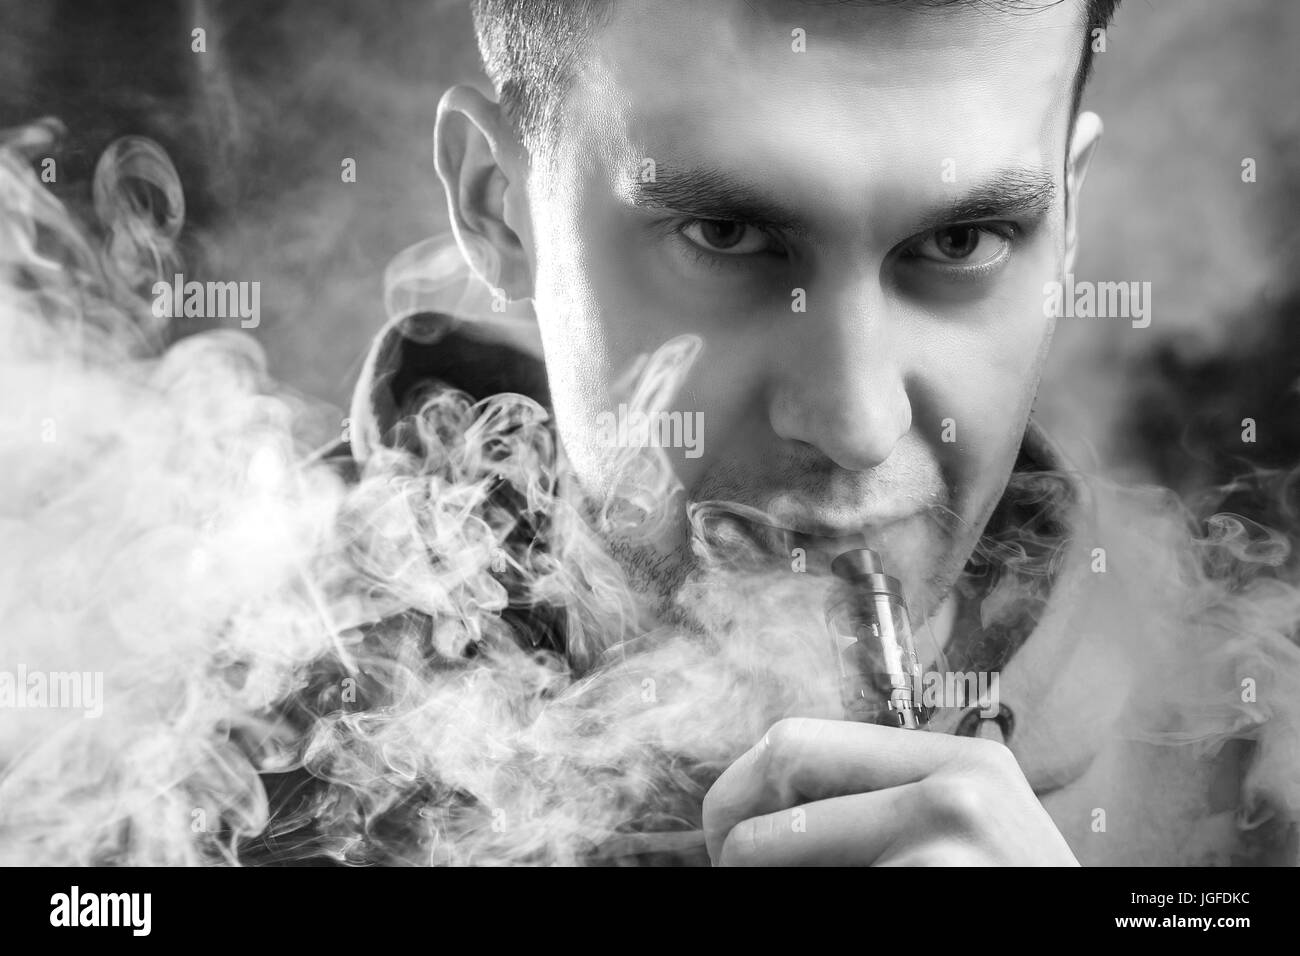 A man smokes a vape, lets steam, studio, colored smoke. Black and White - Stock Image